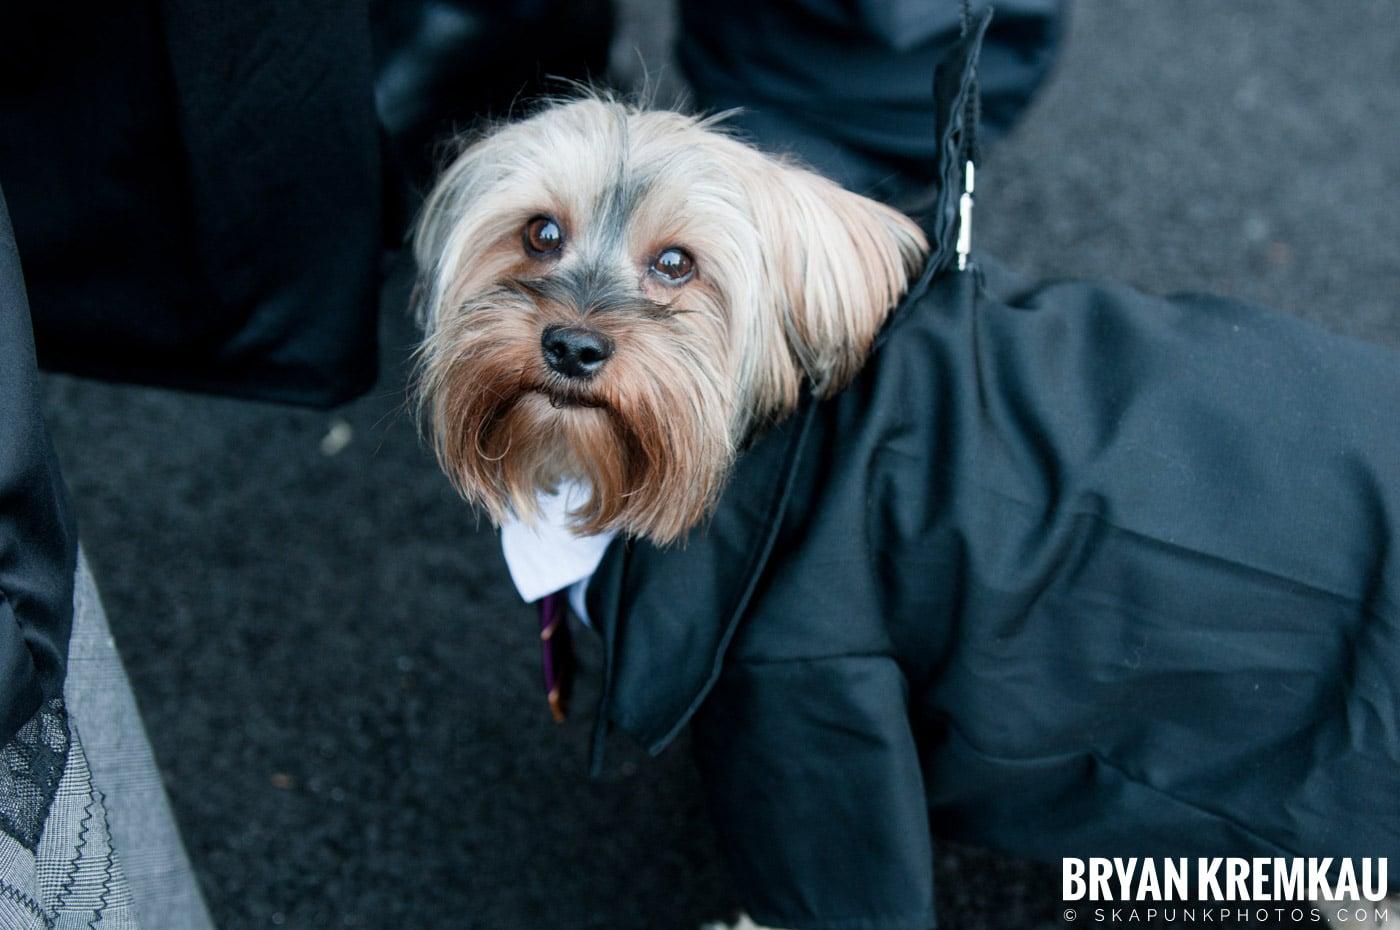 Paulus Hook Halloween Pet Parade 2011 @ Jersey City, NJ - 10.30.11 (65)